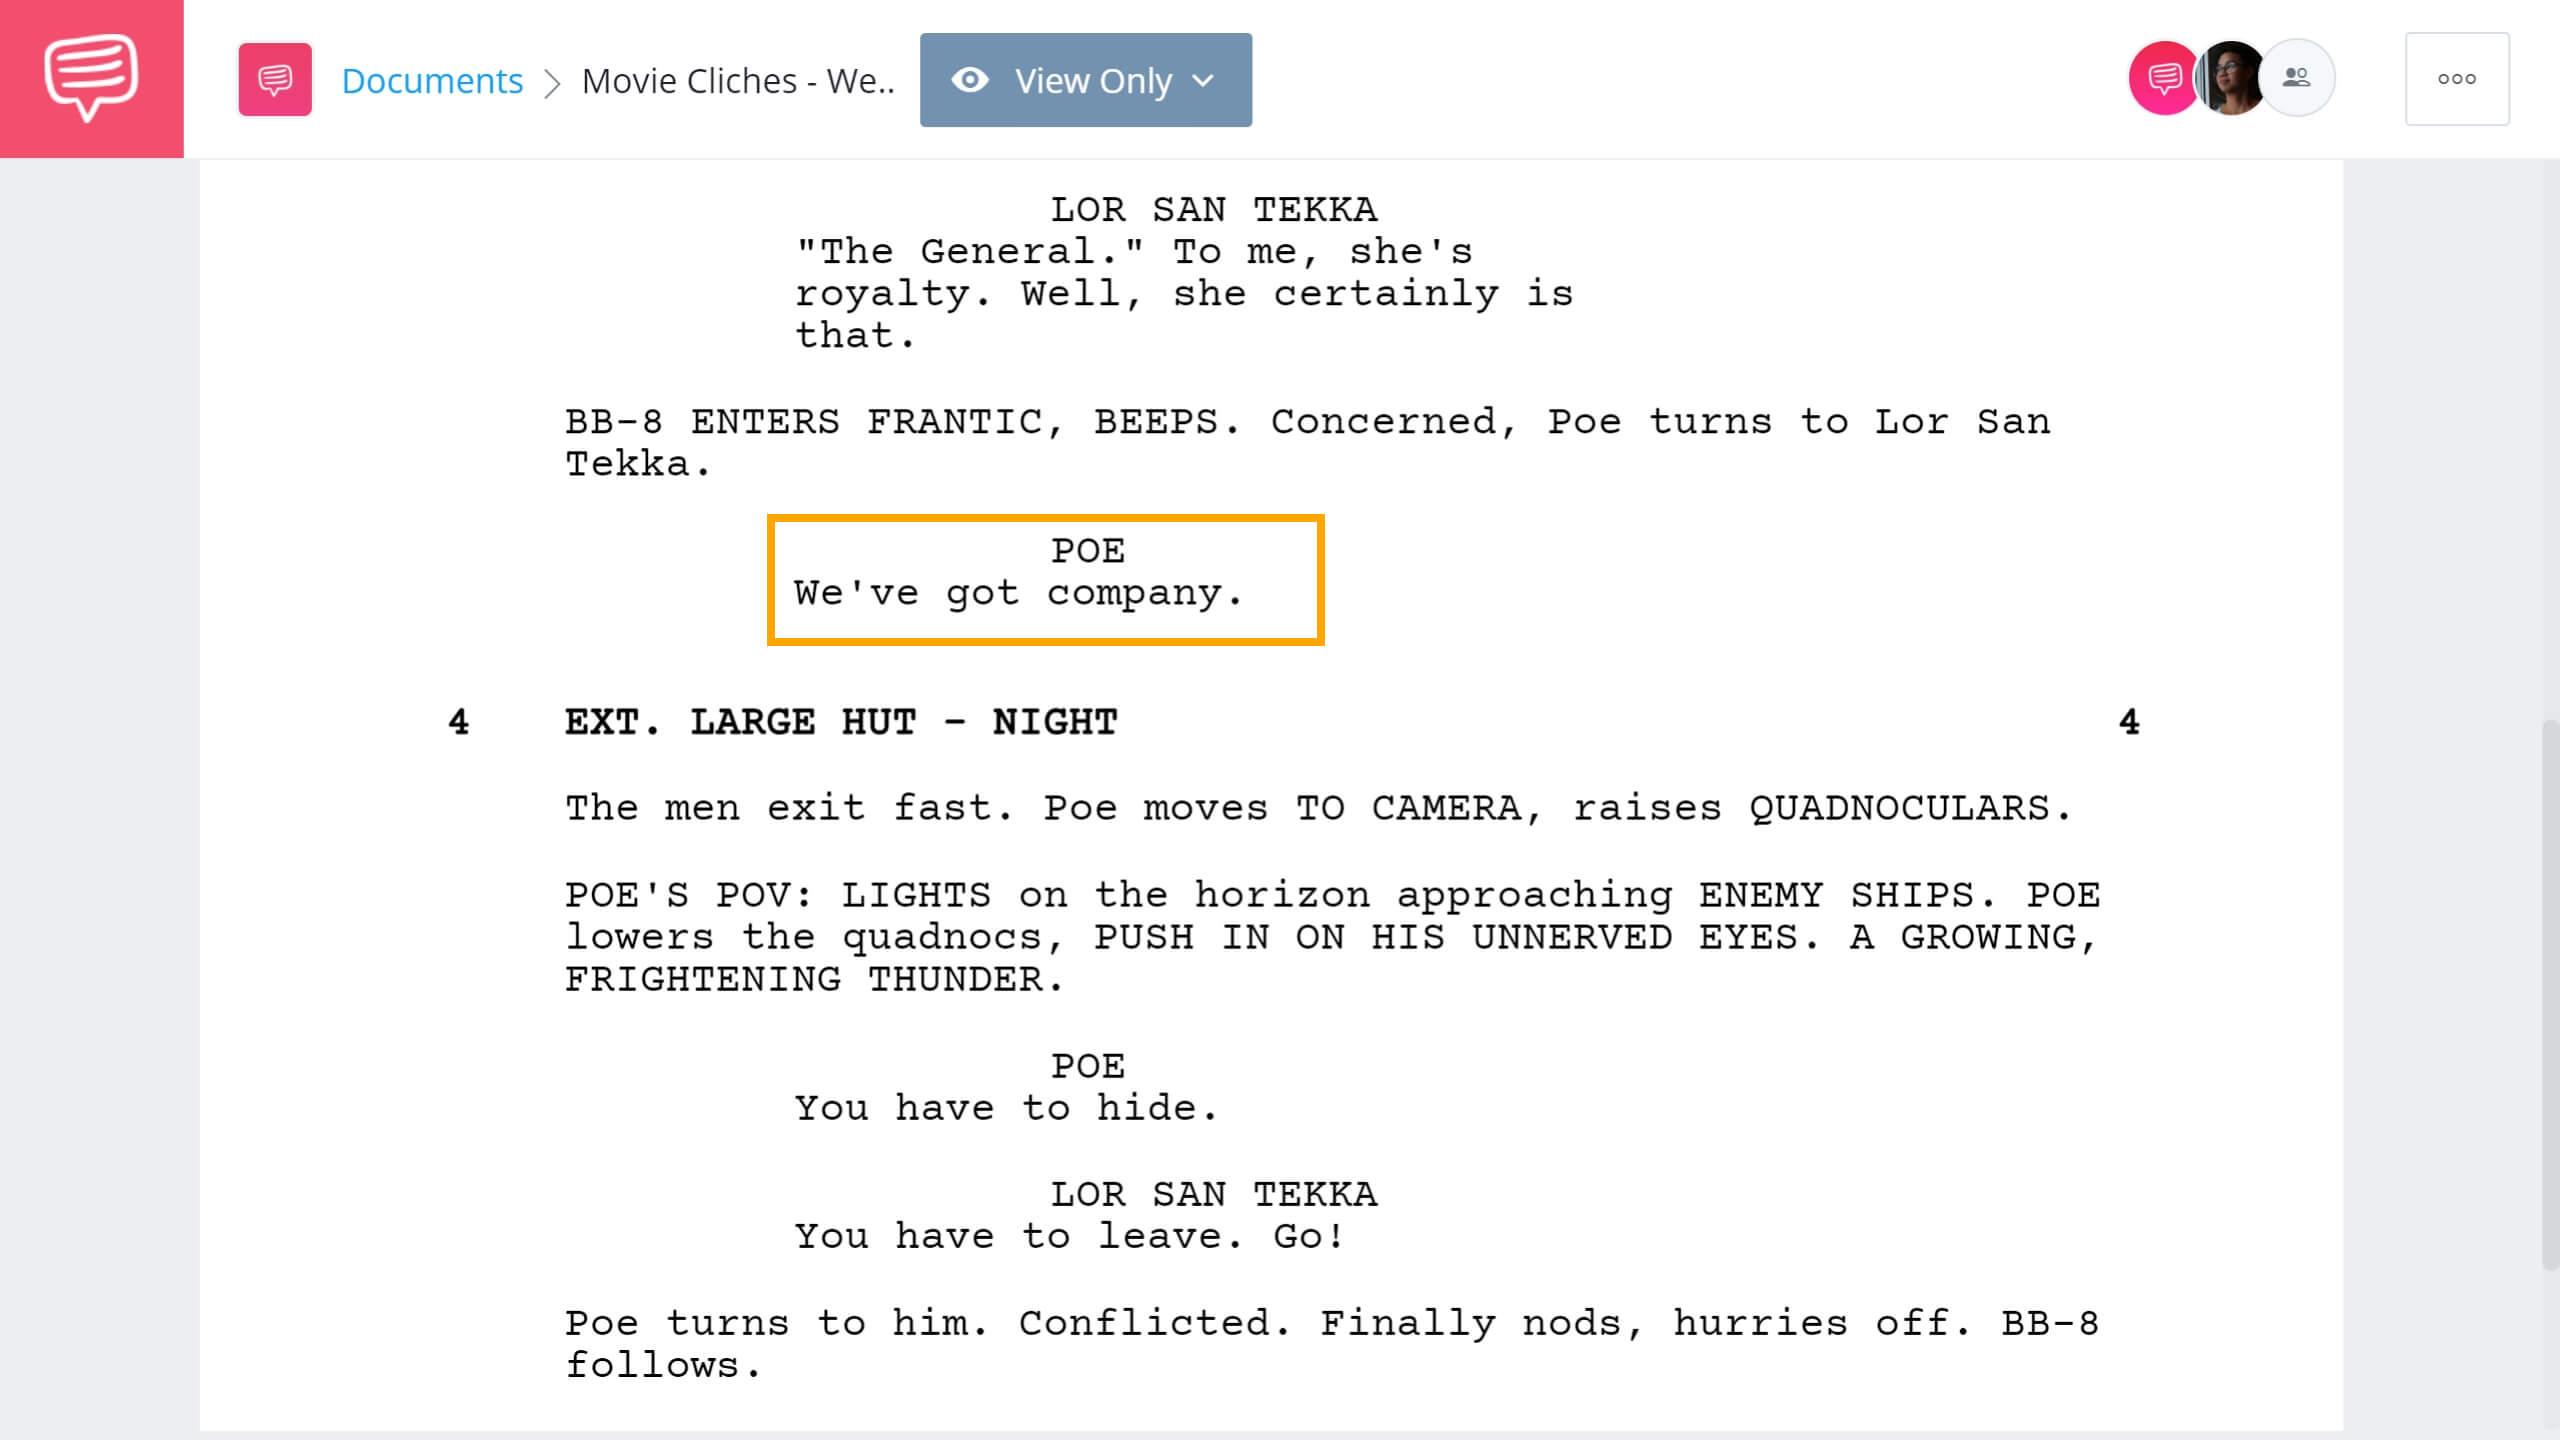 Movie Cliches To Avoid Weve Got Company Scene StudioBinder Screenwriting Software